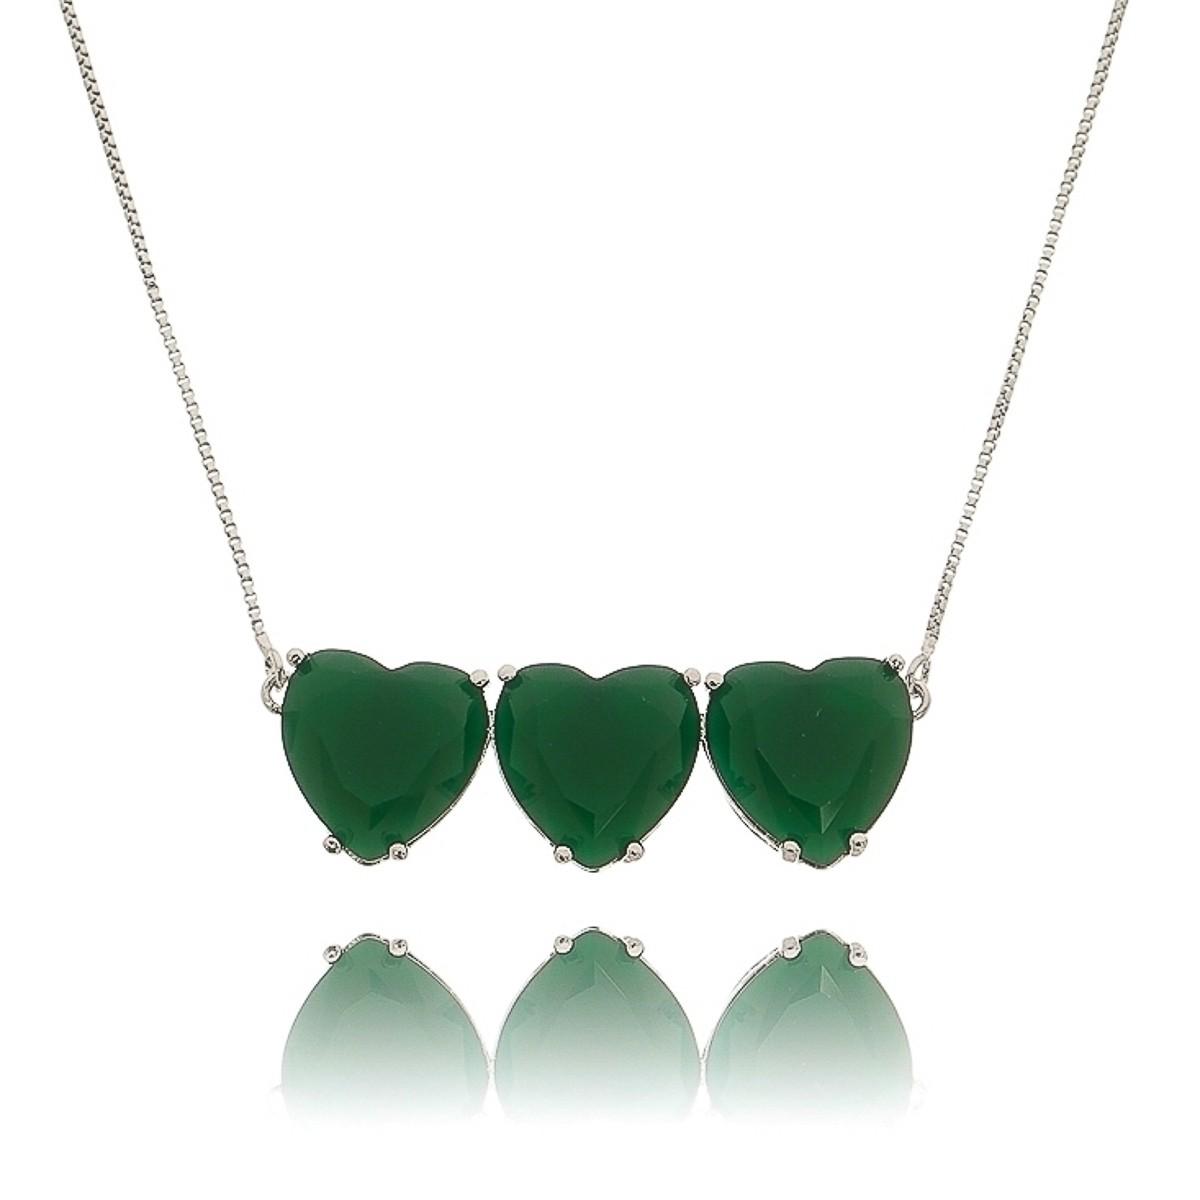 Colar Corações Prata Verde Esmeralda Semijoia Fina em Ródio Branco  - Soloyou